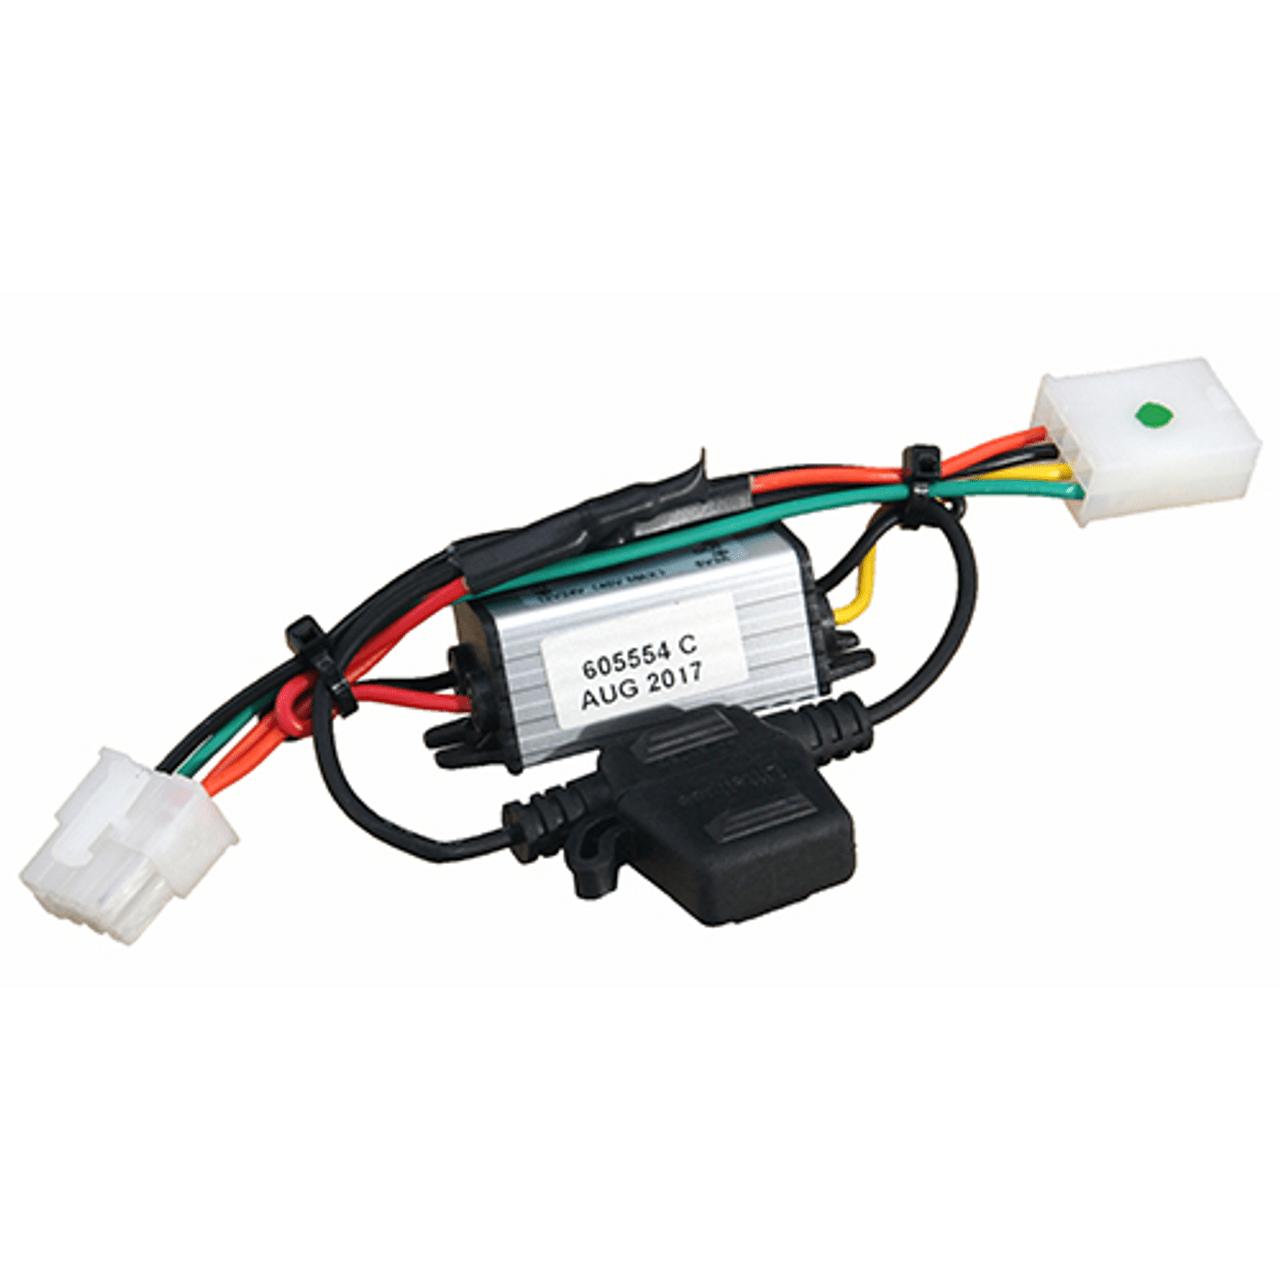 medium resolution of hustler wire harness adapter 605554